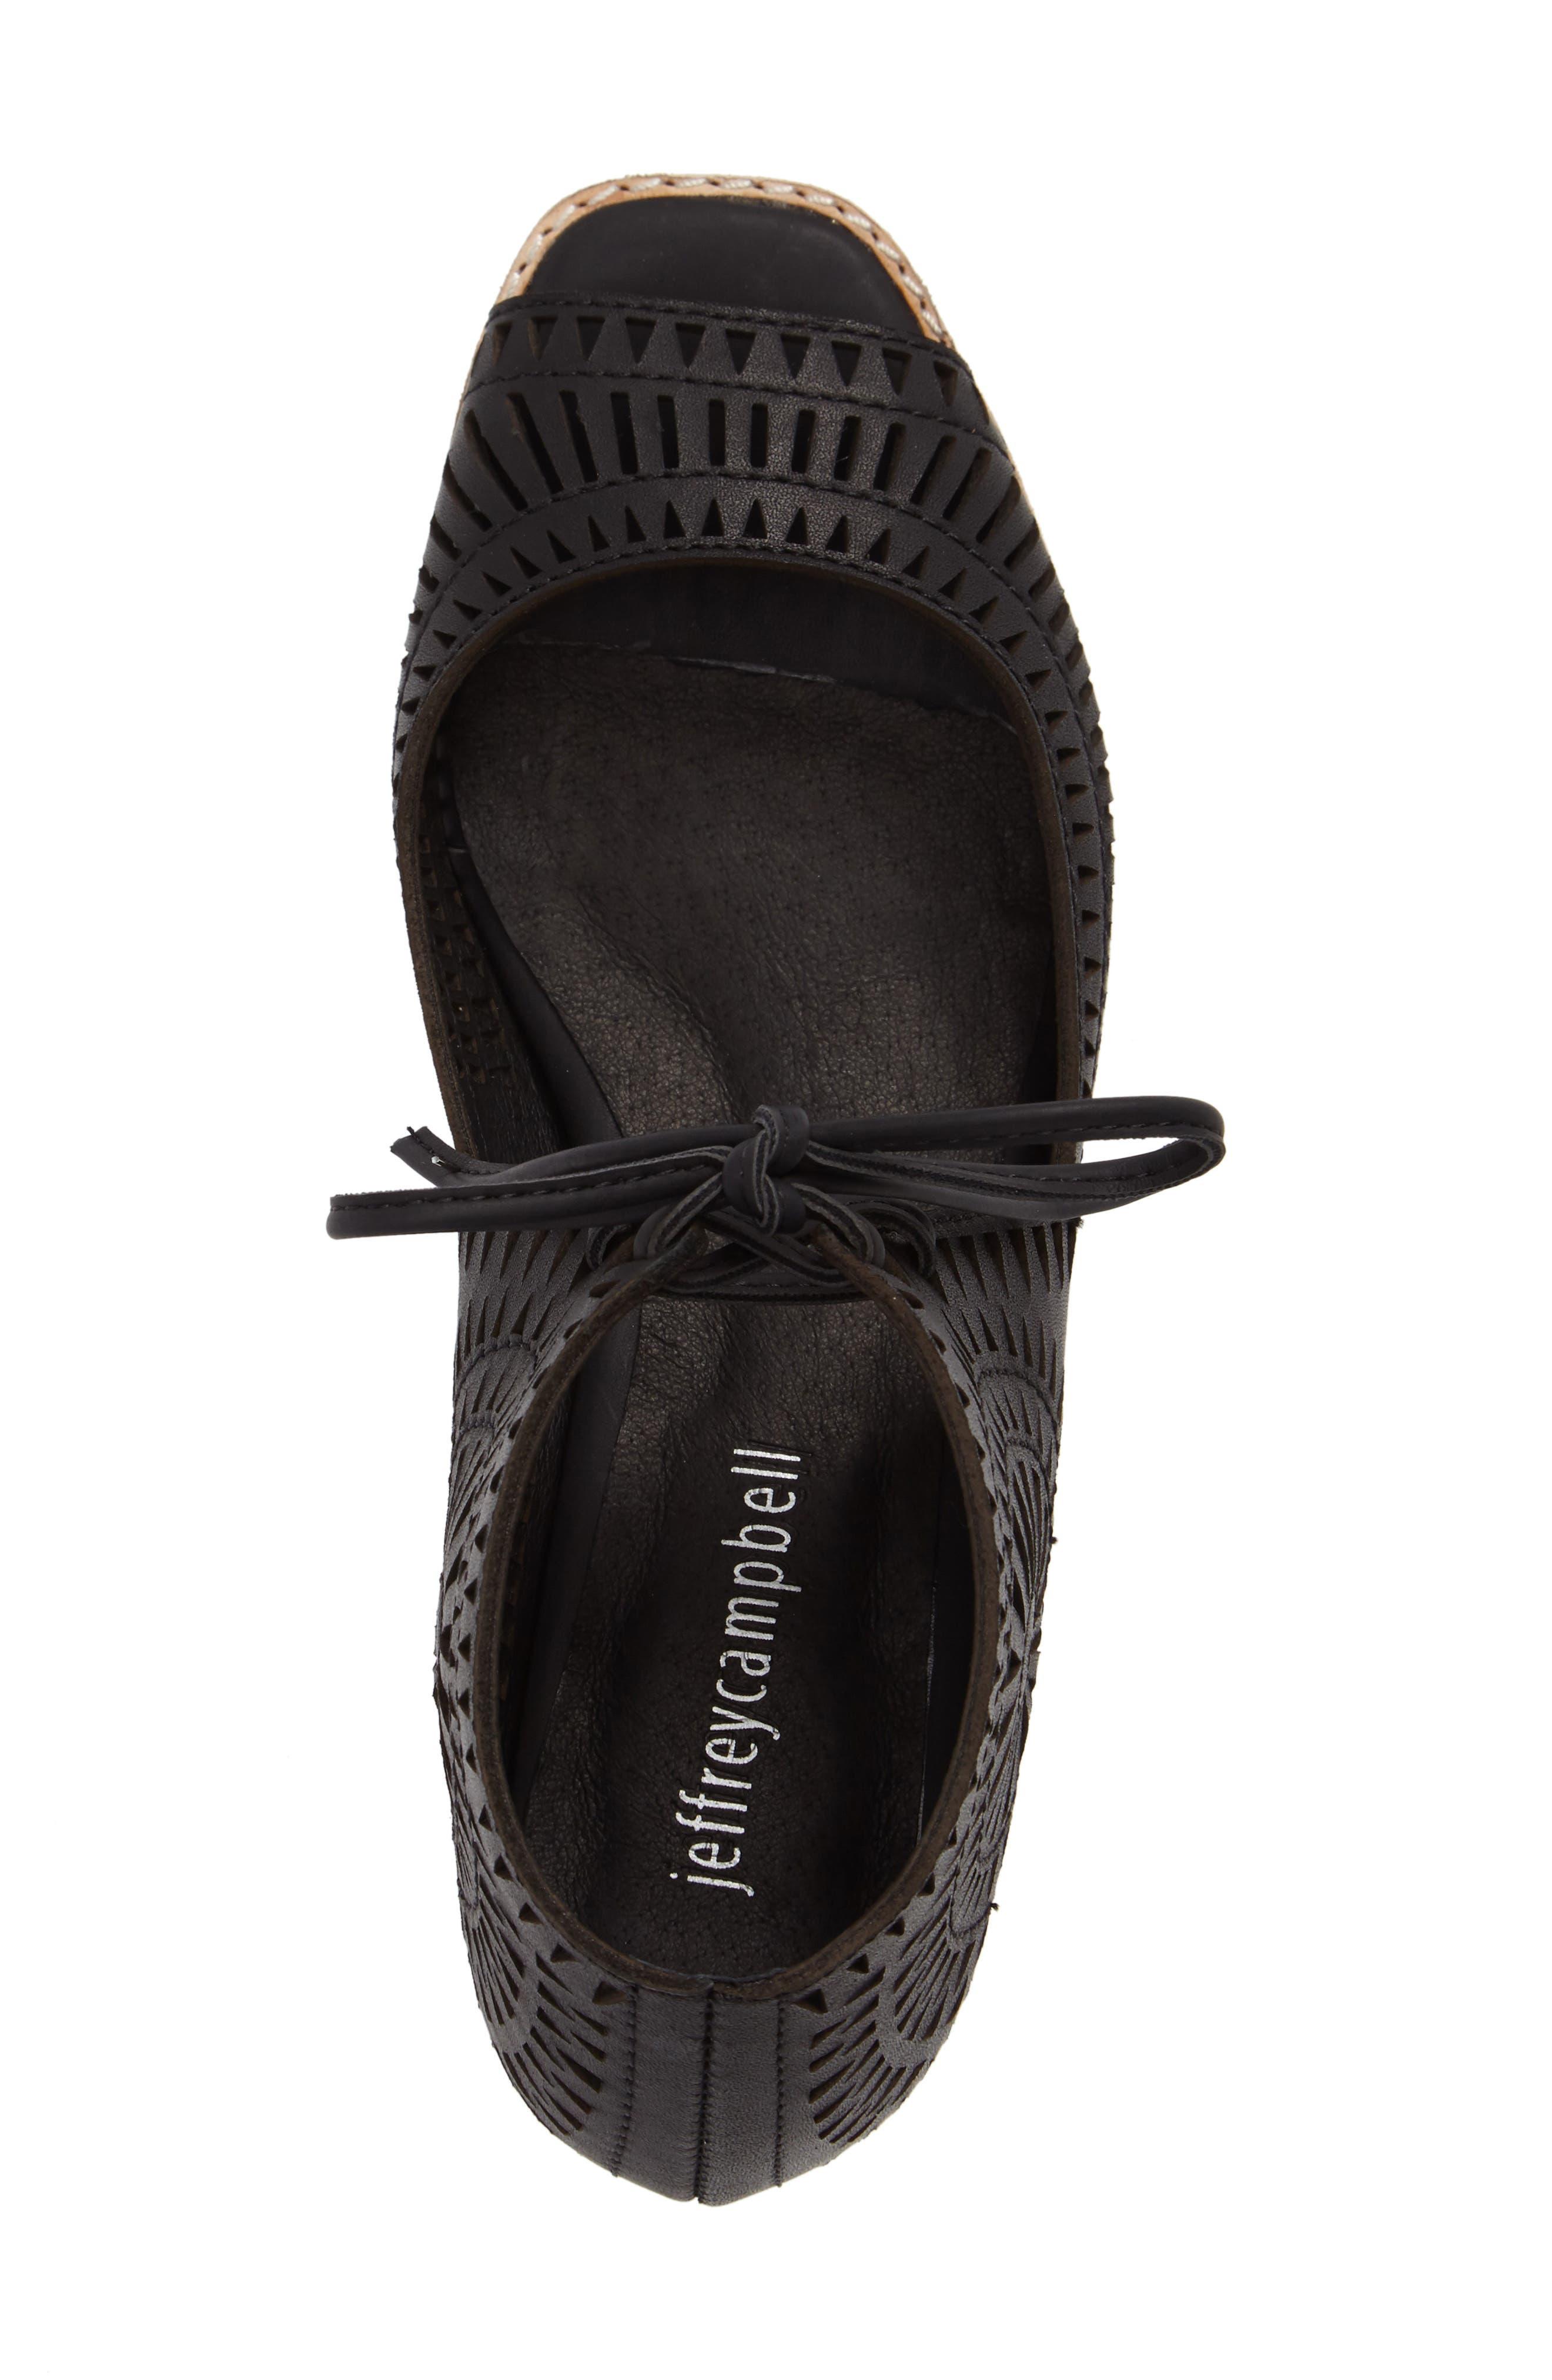 Rayos Perforated Wedge Sandal,                             Alternate thumbnail 5, color,                             001